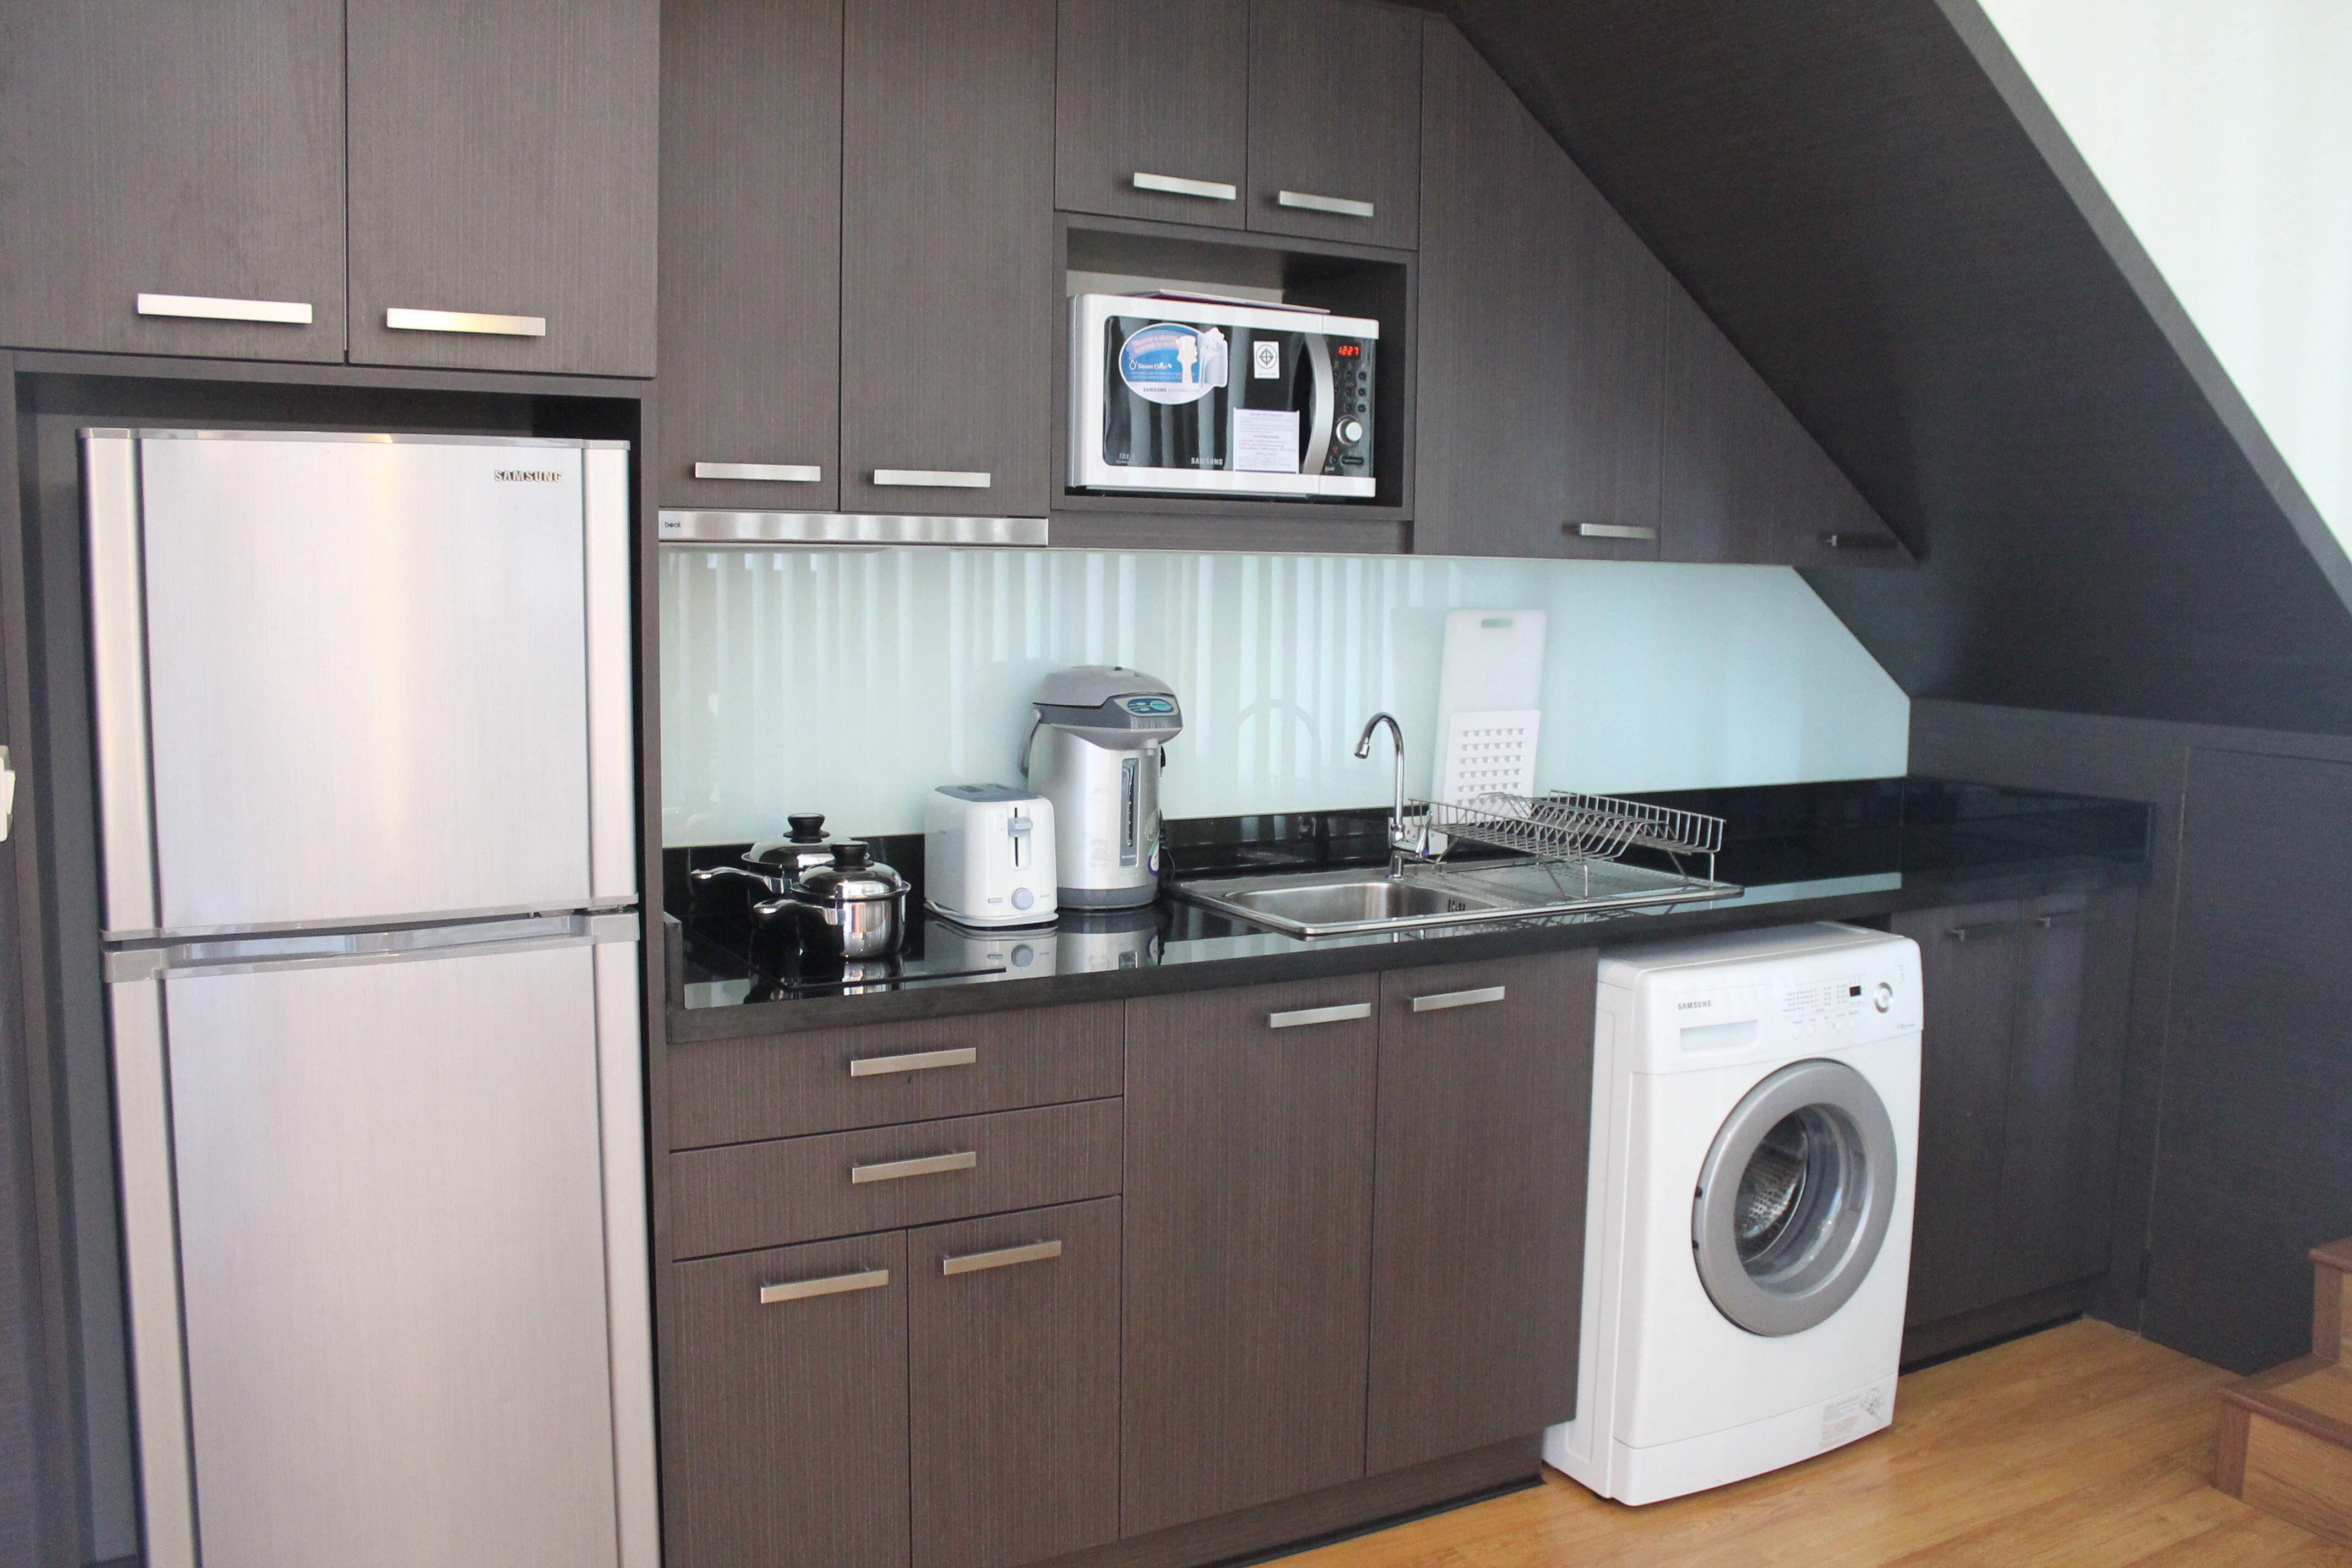 Small Kitchen For Narrow With Washing Machine Washing Machine In Kitchen Kitchen Interior Design Modern Kitchen Design